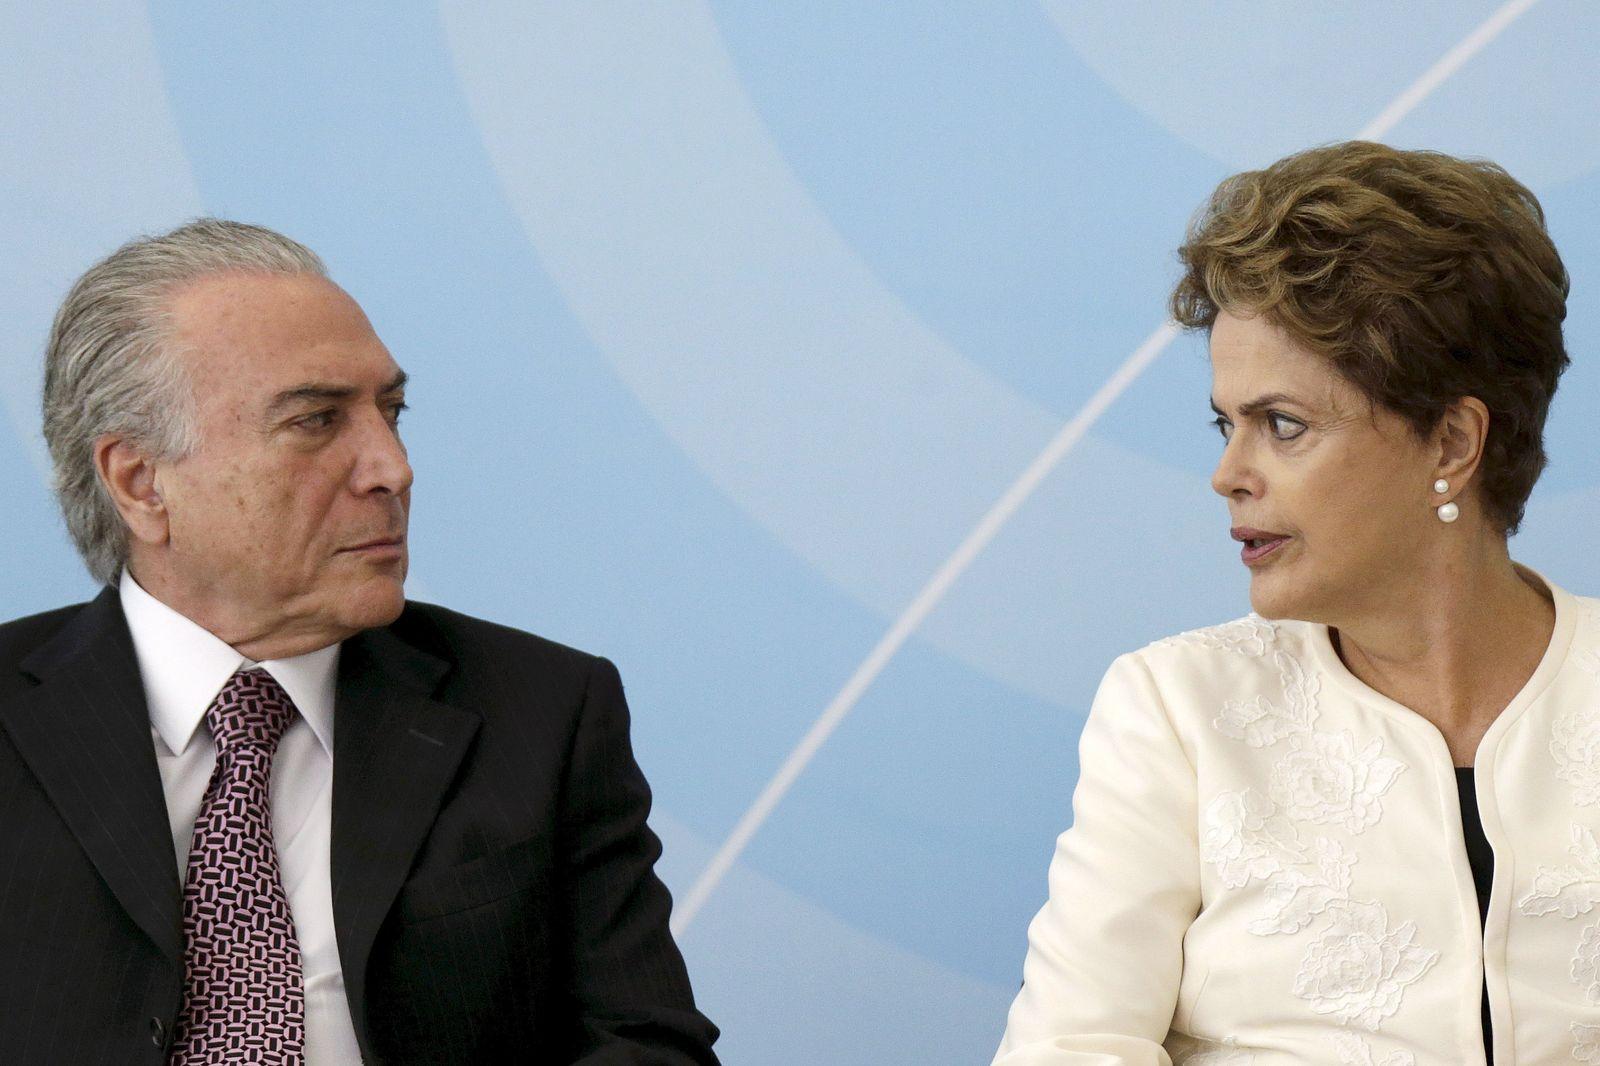 Michel Temer / Dilma Rousseff